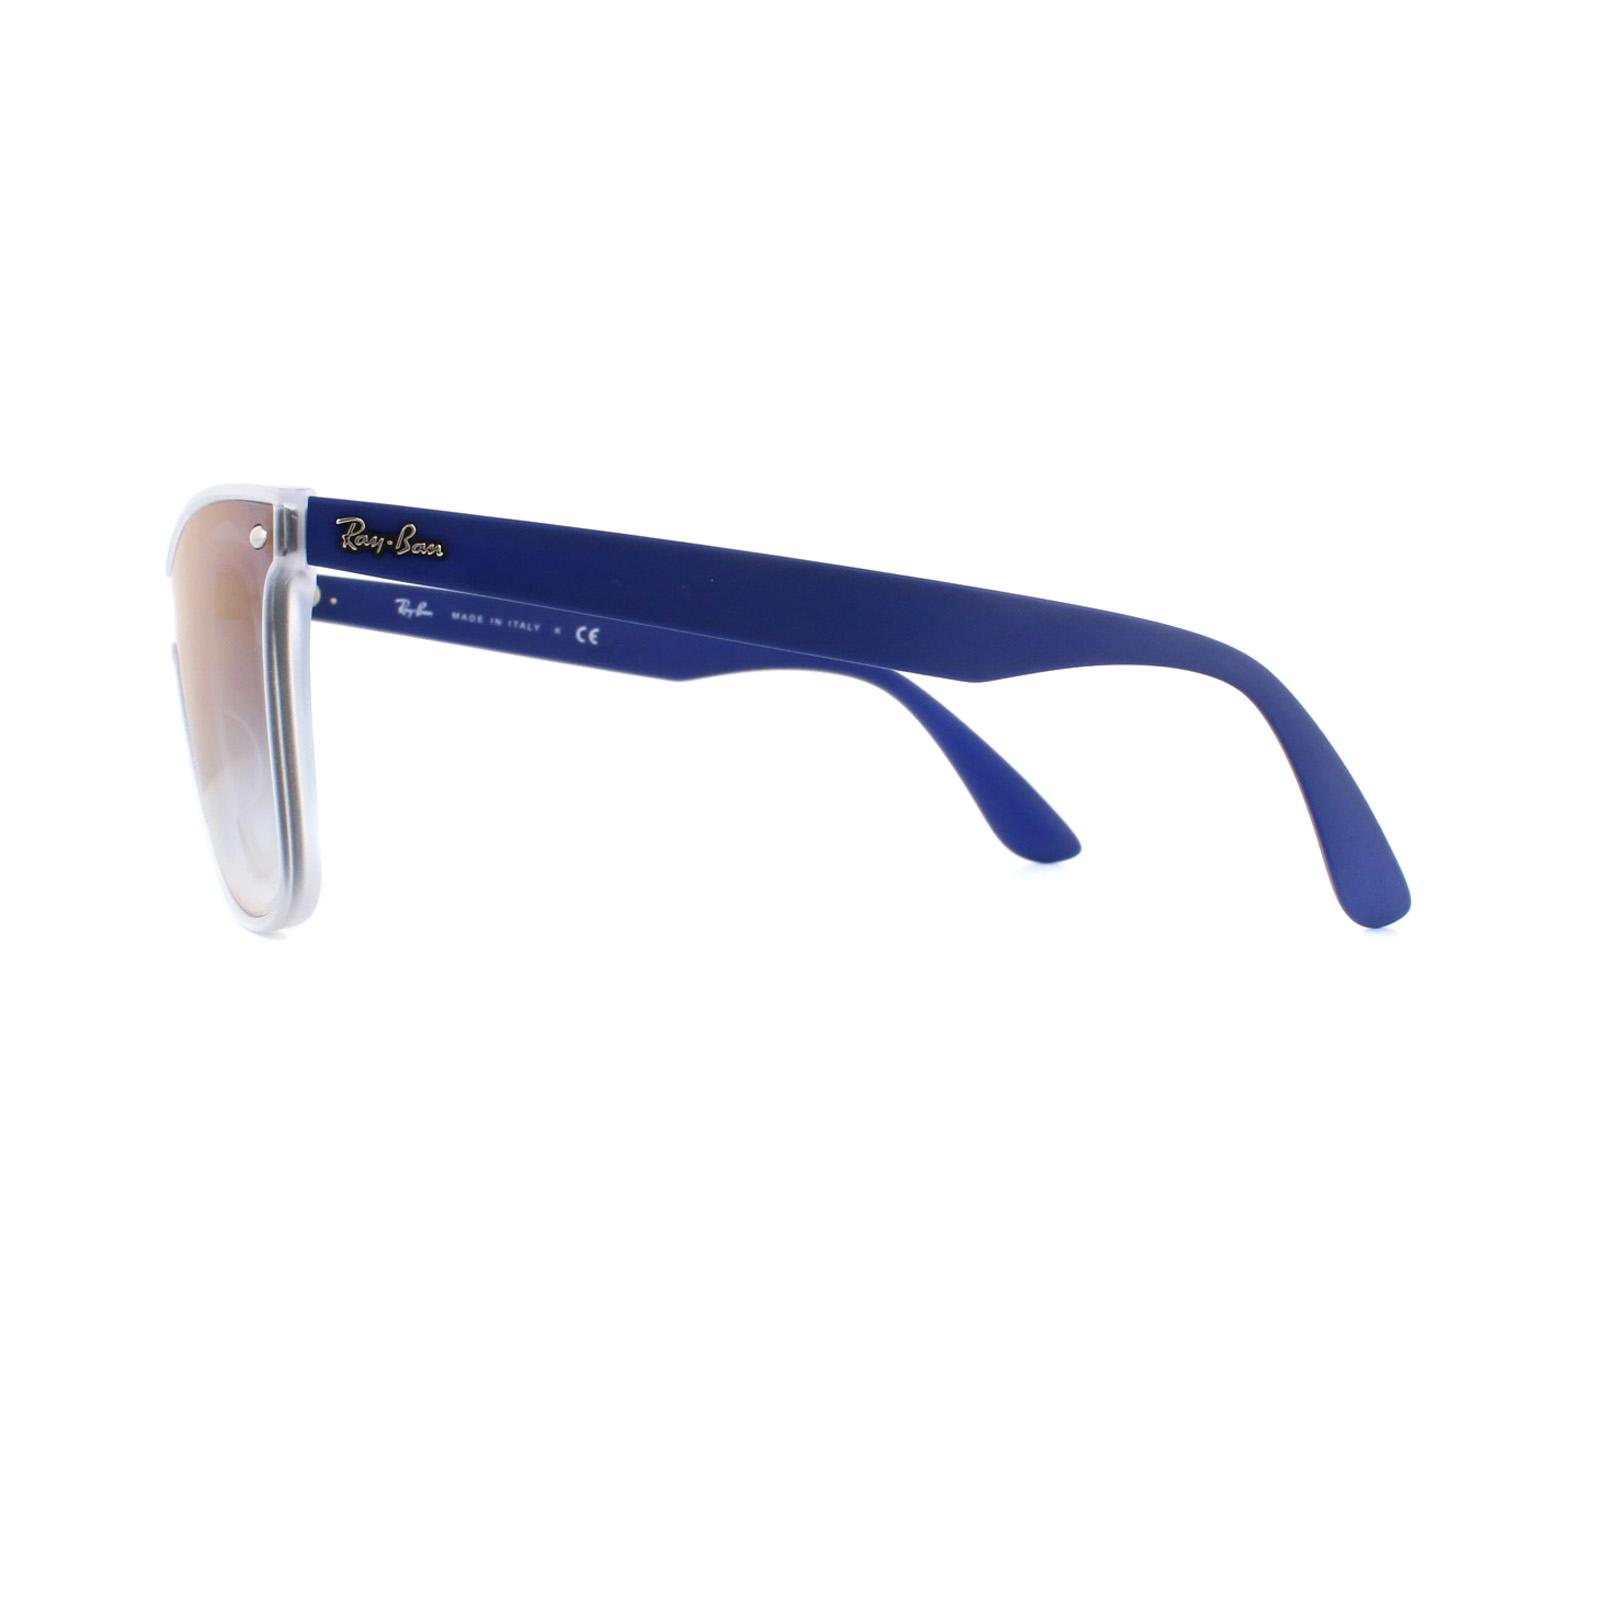 80dbde6c7cc48 Sentinel Ray-Ban Sunglasses Blaze Wayfarer 4440N 6356X0 Transparent Blue